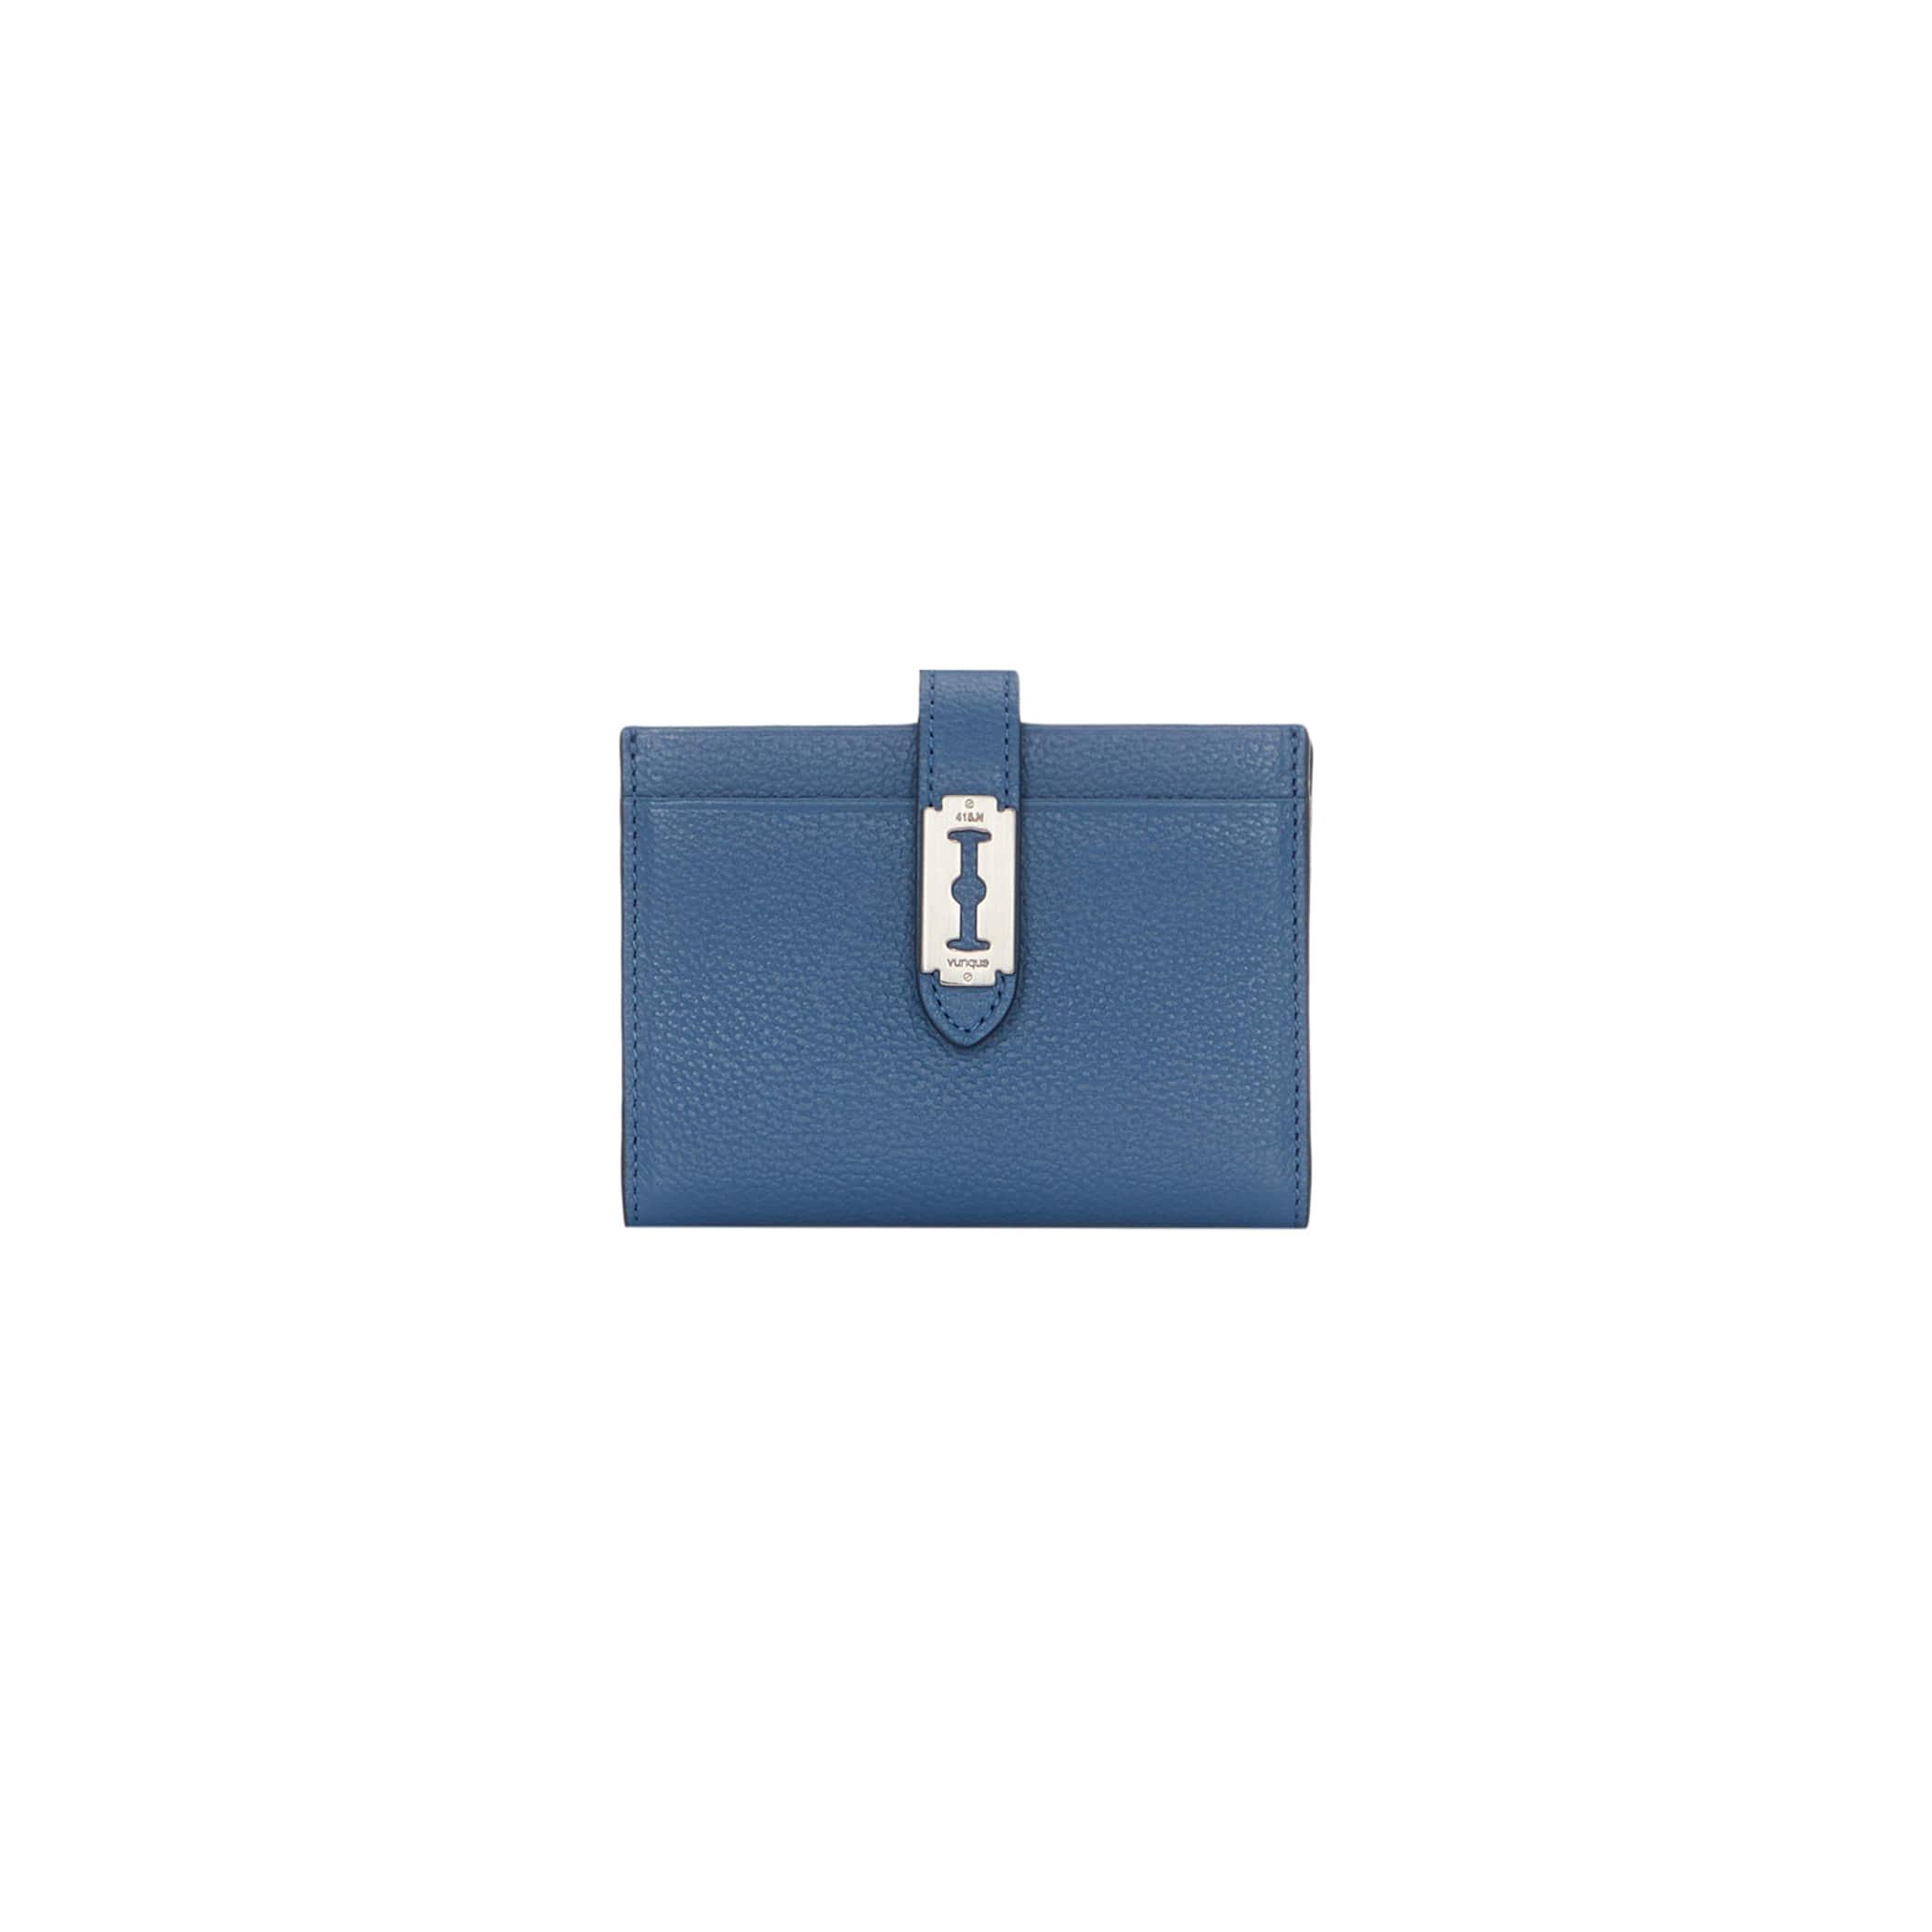 Magpie Card Wallet (맥파이 카드지갑) Aube Blue